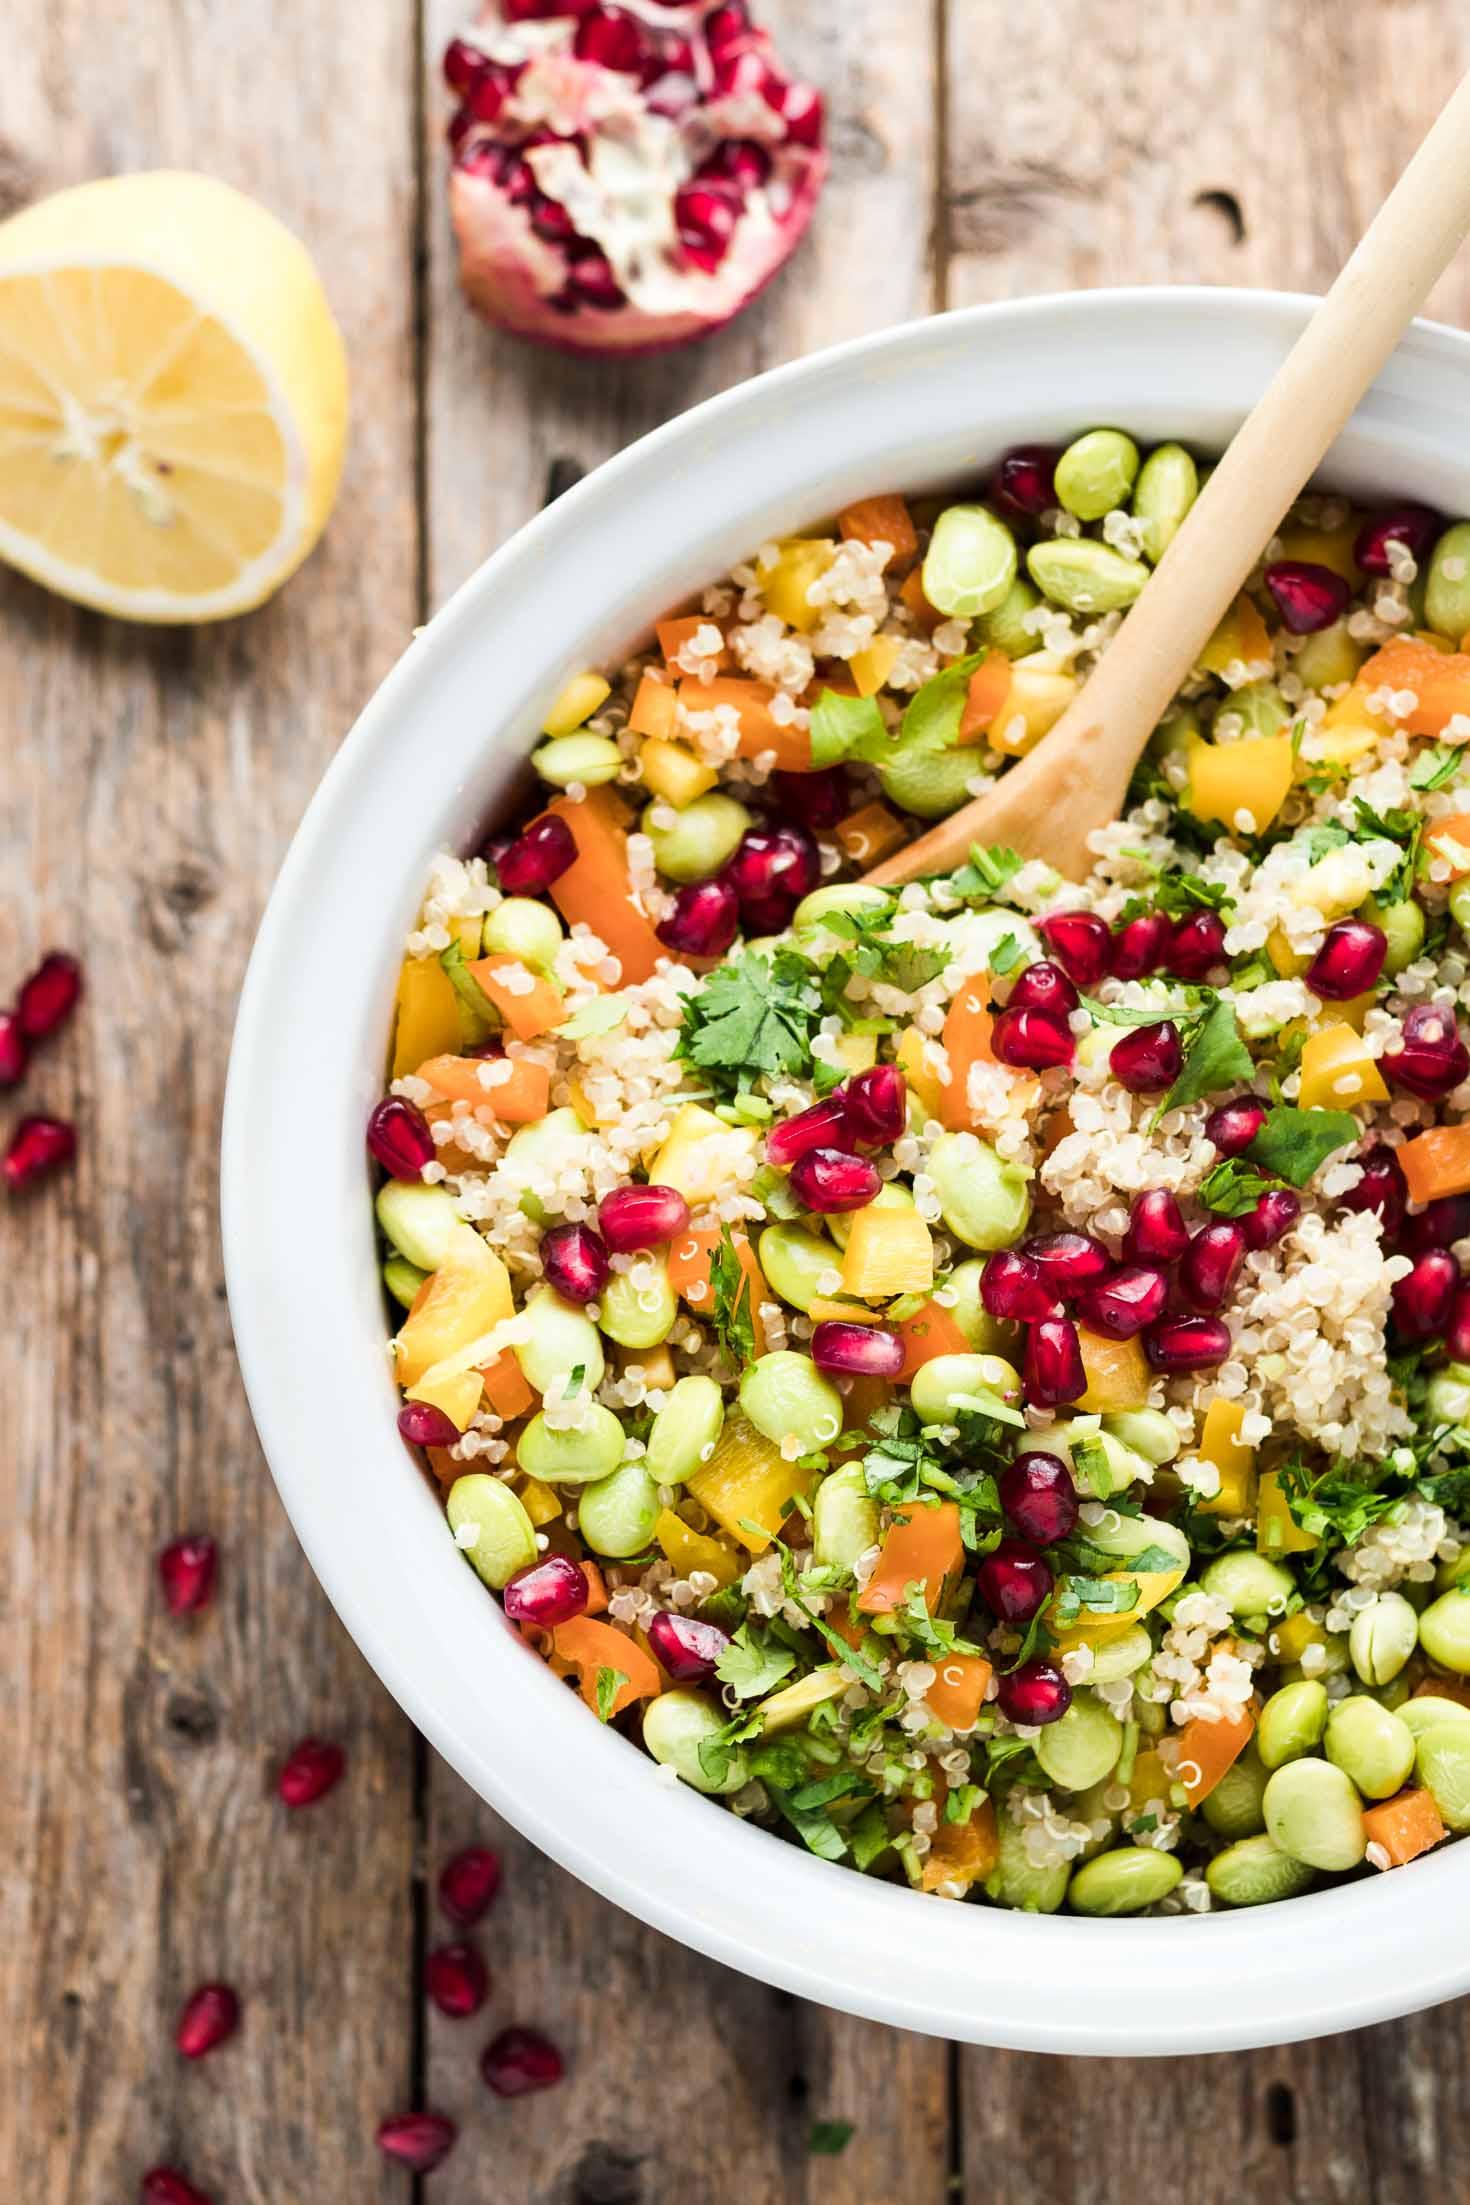 30-Minute Pomegranate Edamame Quinoa Salad-top view-in a white bowl